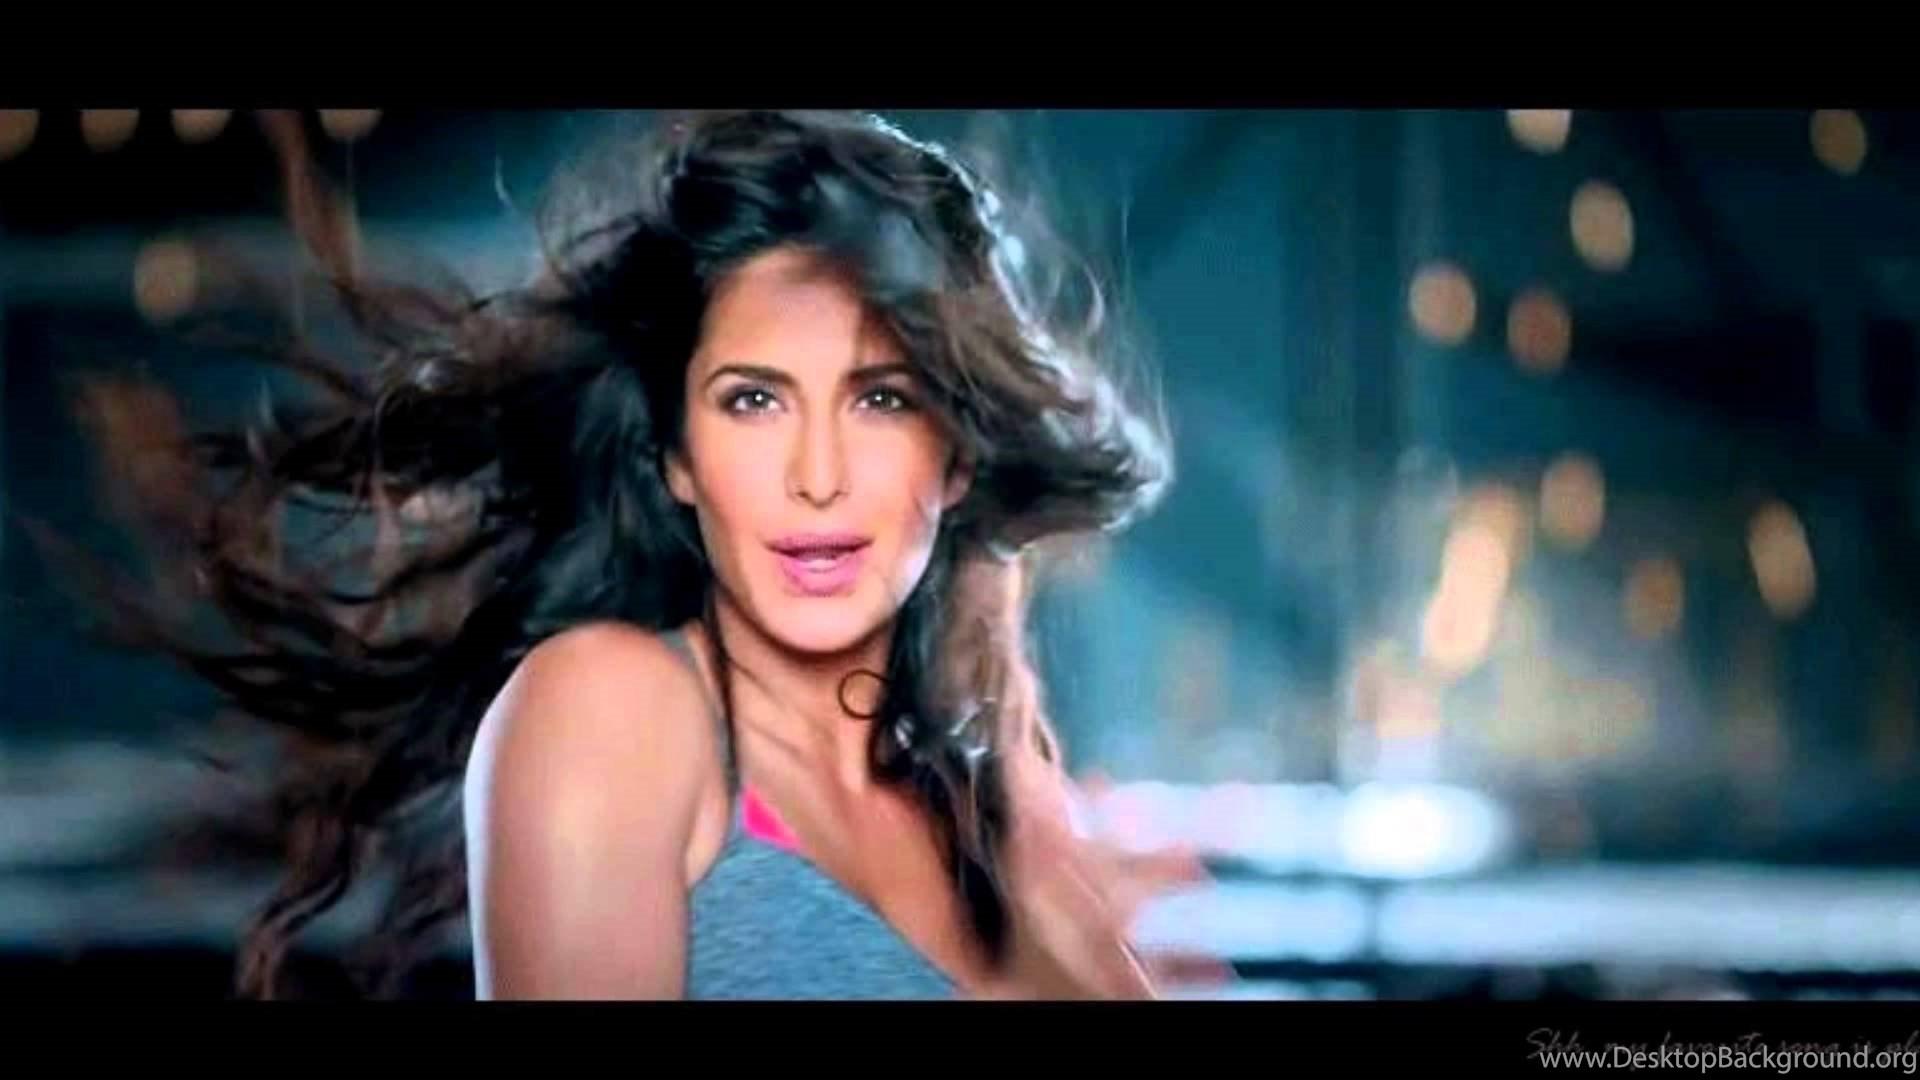 kamli full song dhoom:3 katrina kaif youtube desktop background